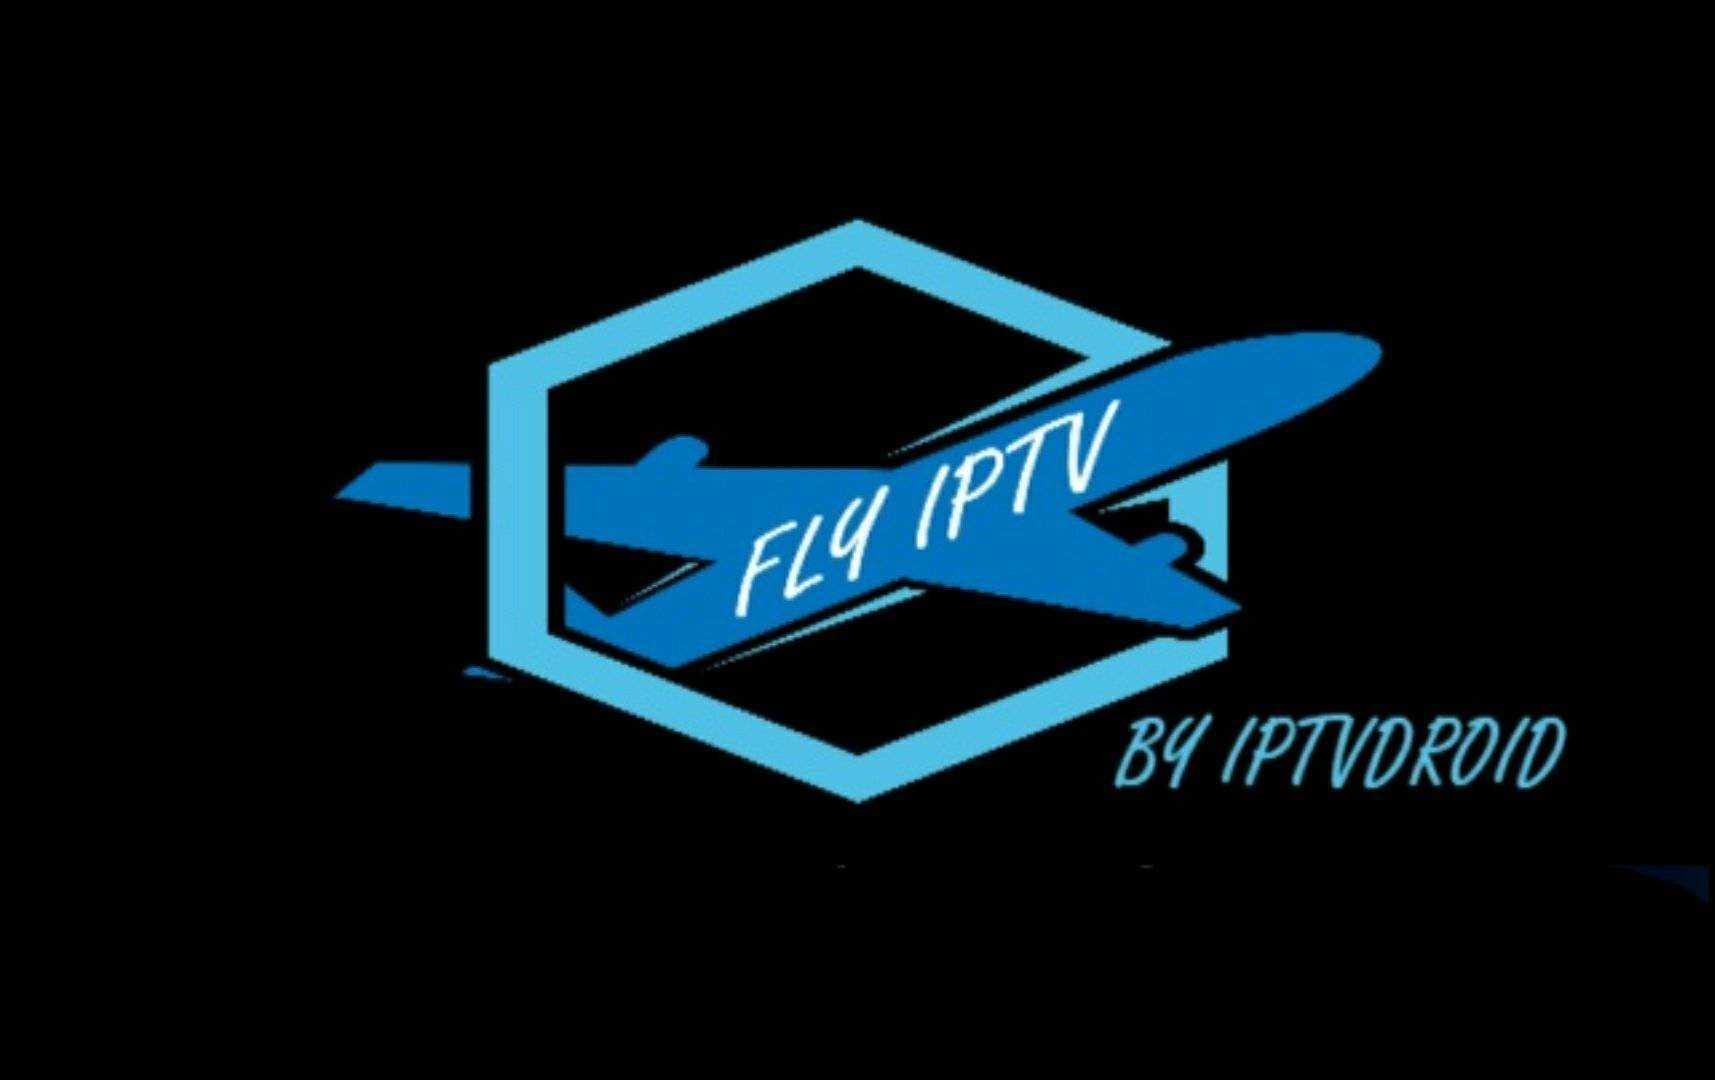 fly-iptv-by-aba.jpg